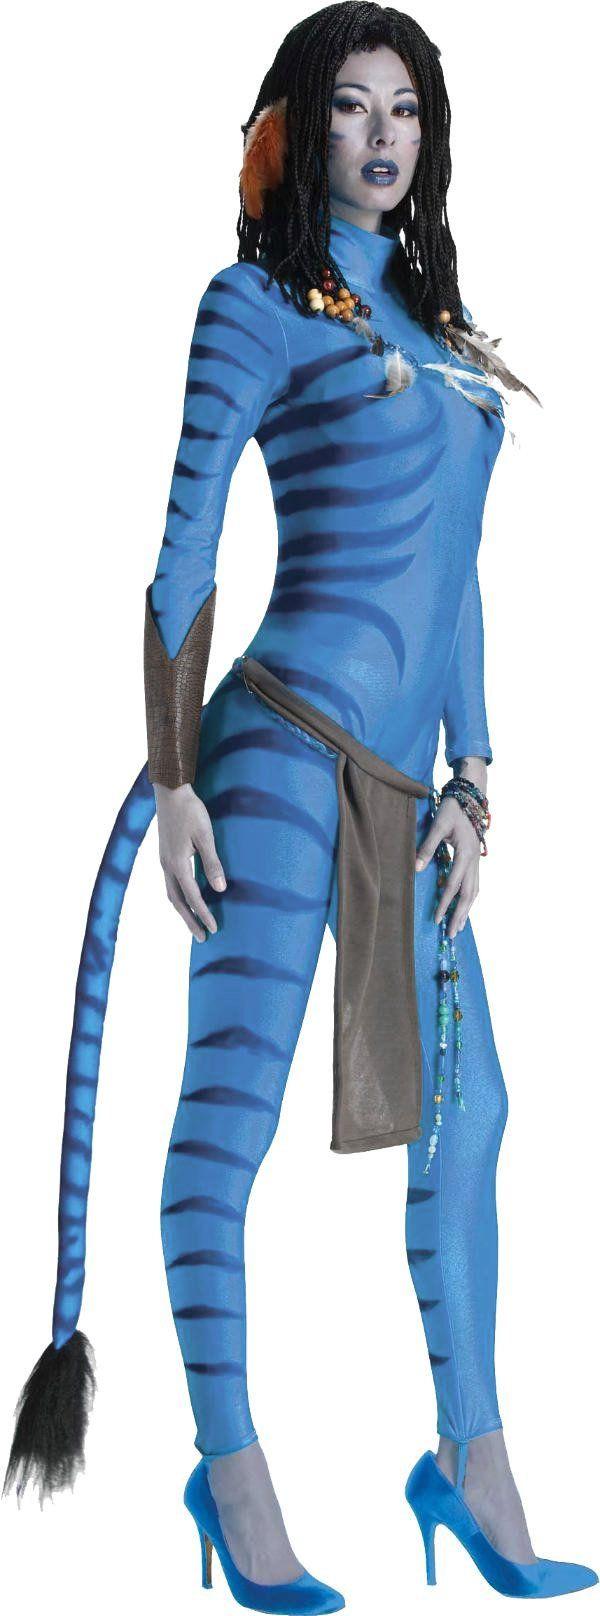 Disfraz de Avatar Neytiri™ para mujer